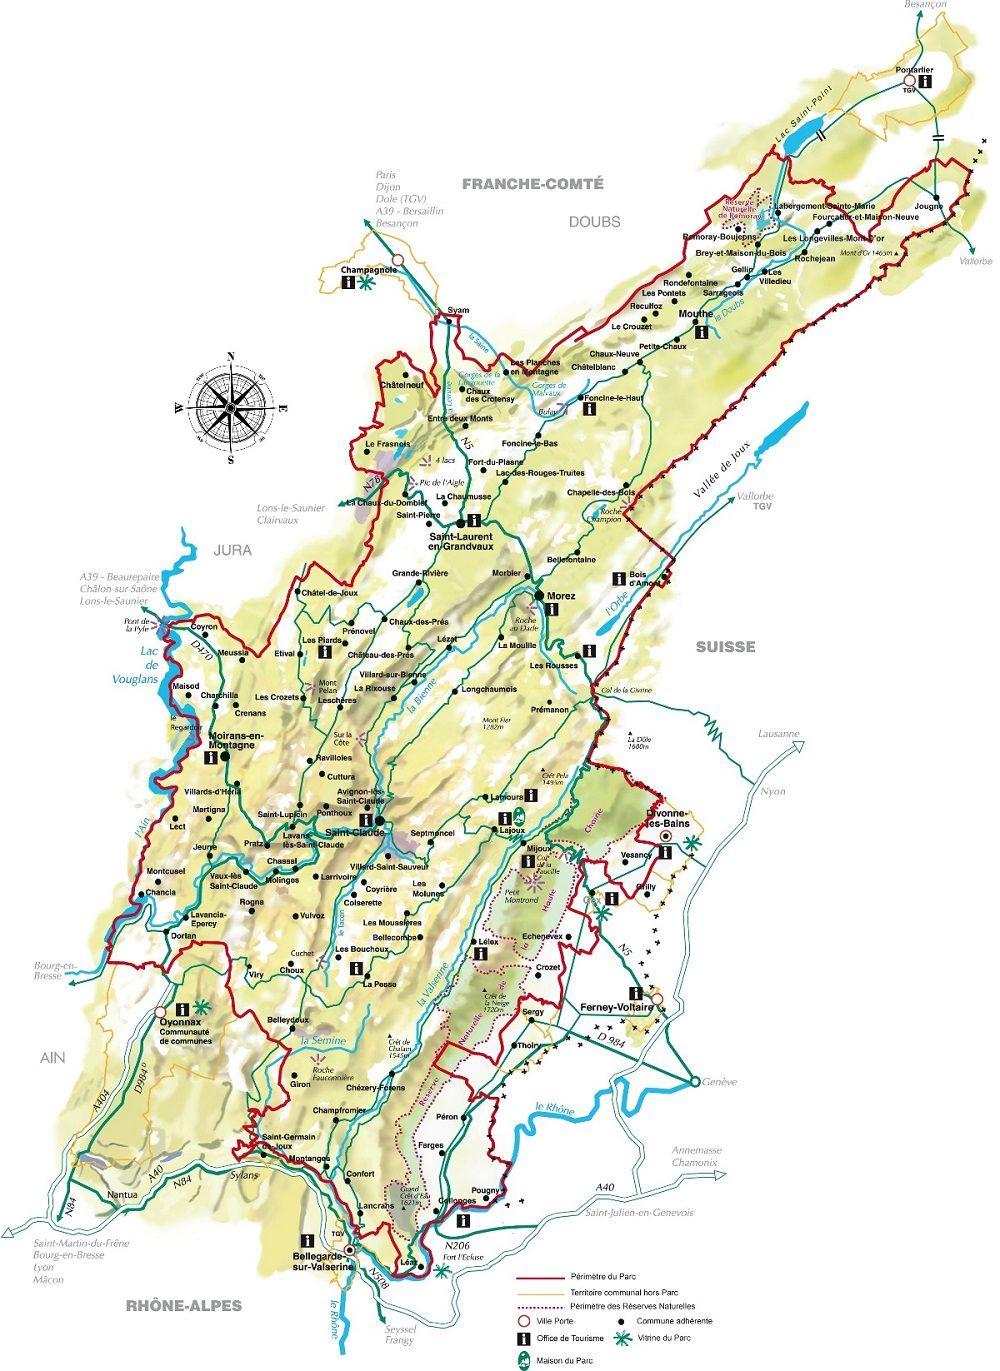 Jura Carte Du Parc Naturel Regional Haut Franche Comte Territoire Belfort Doubs Ain